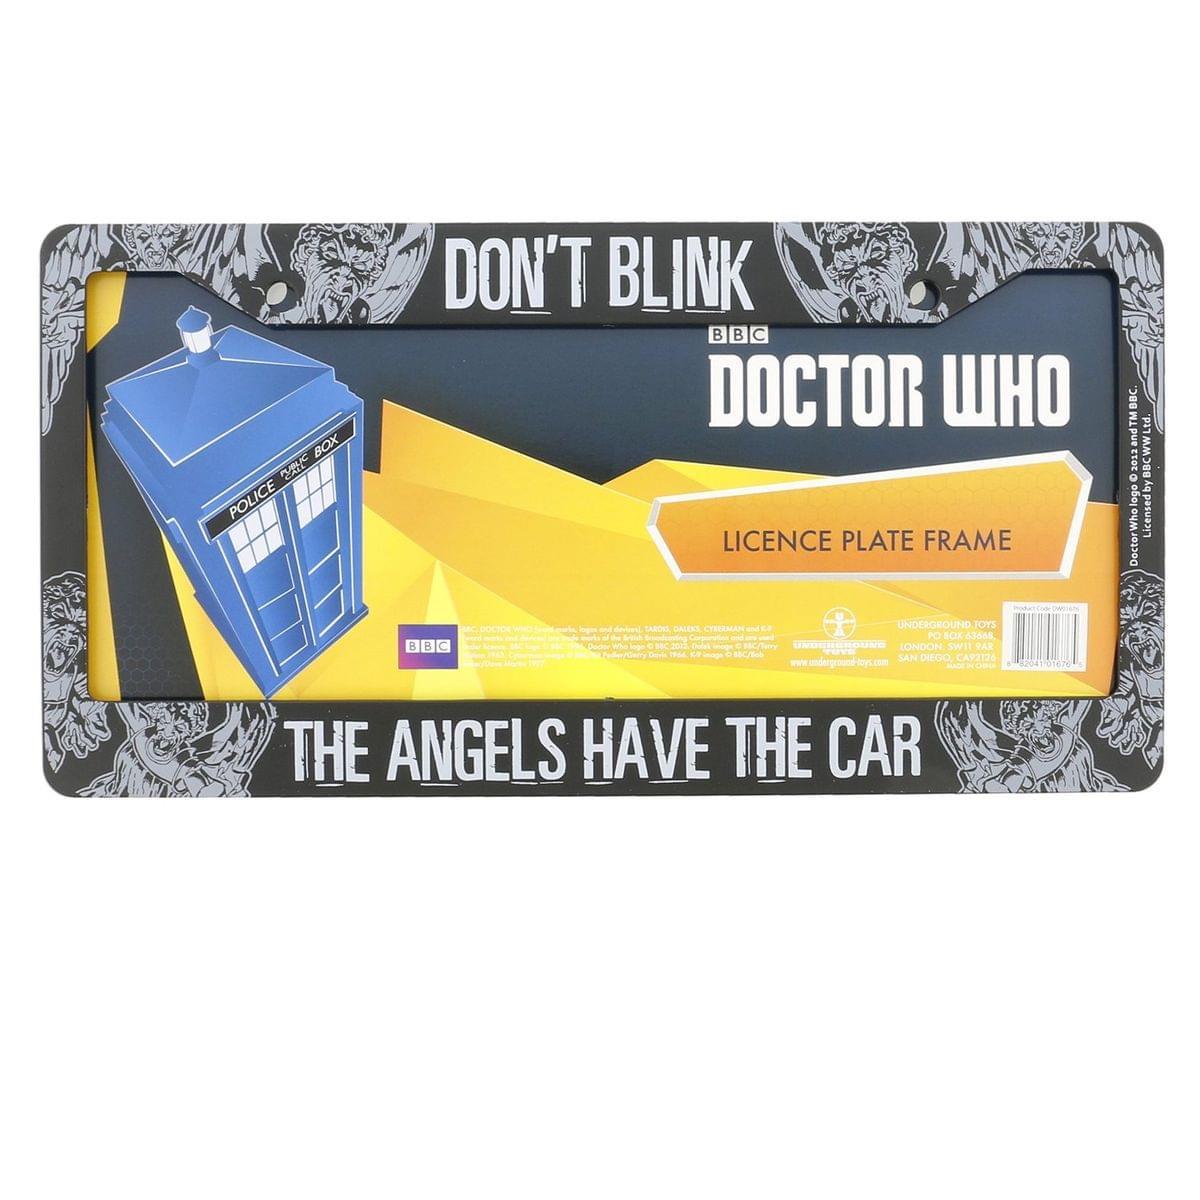 Doctor Who License Plate Frame: Don't Blink